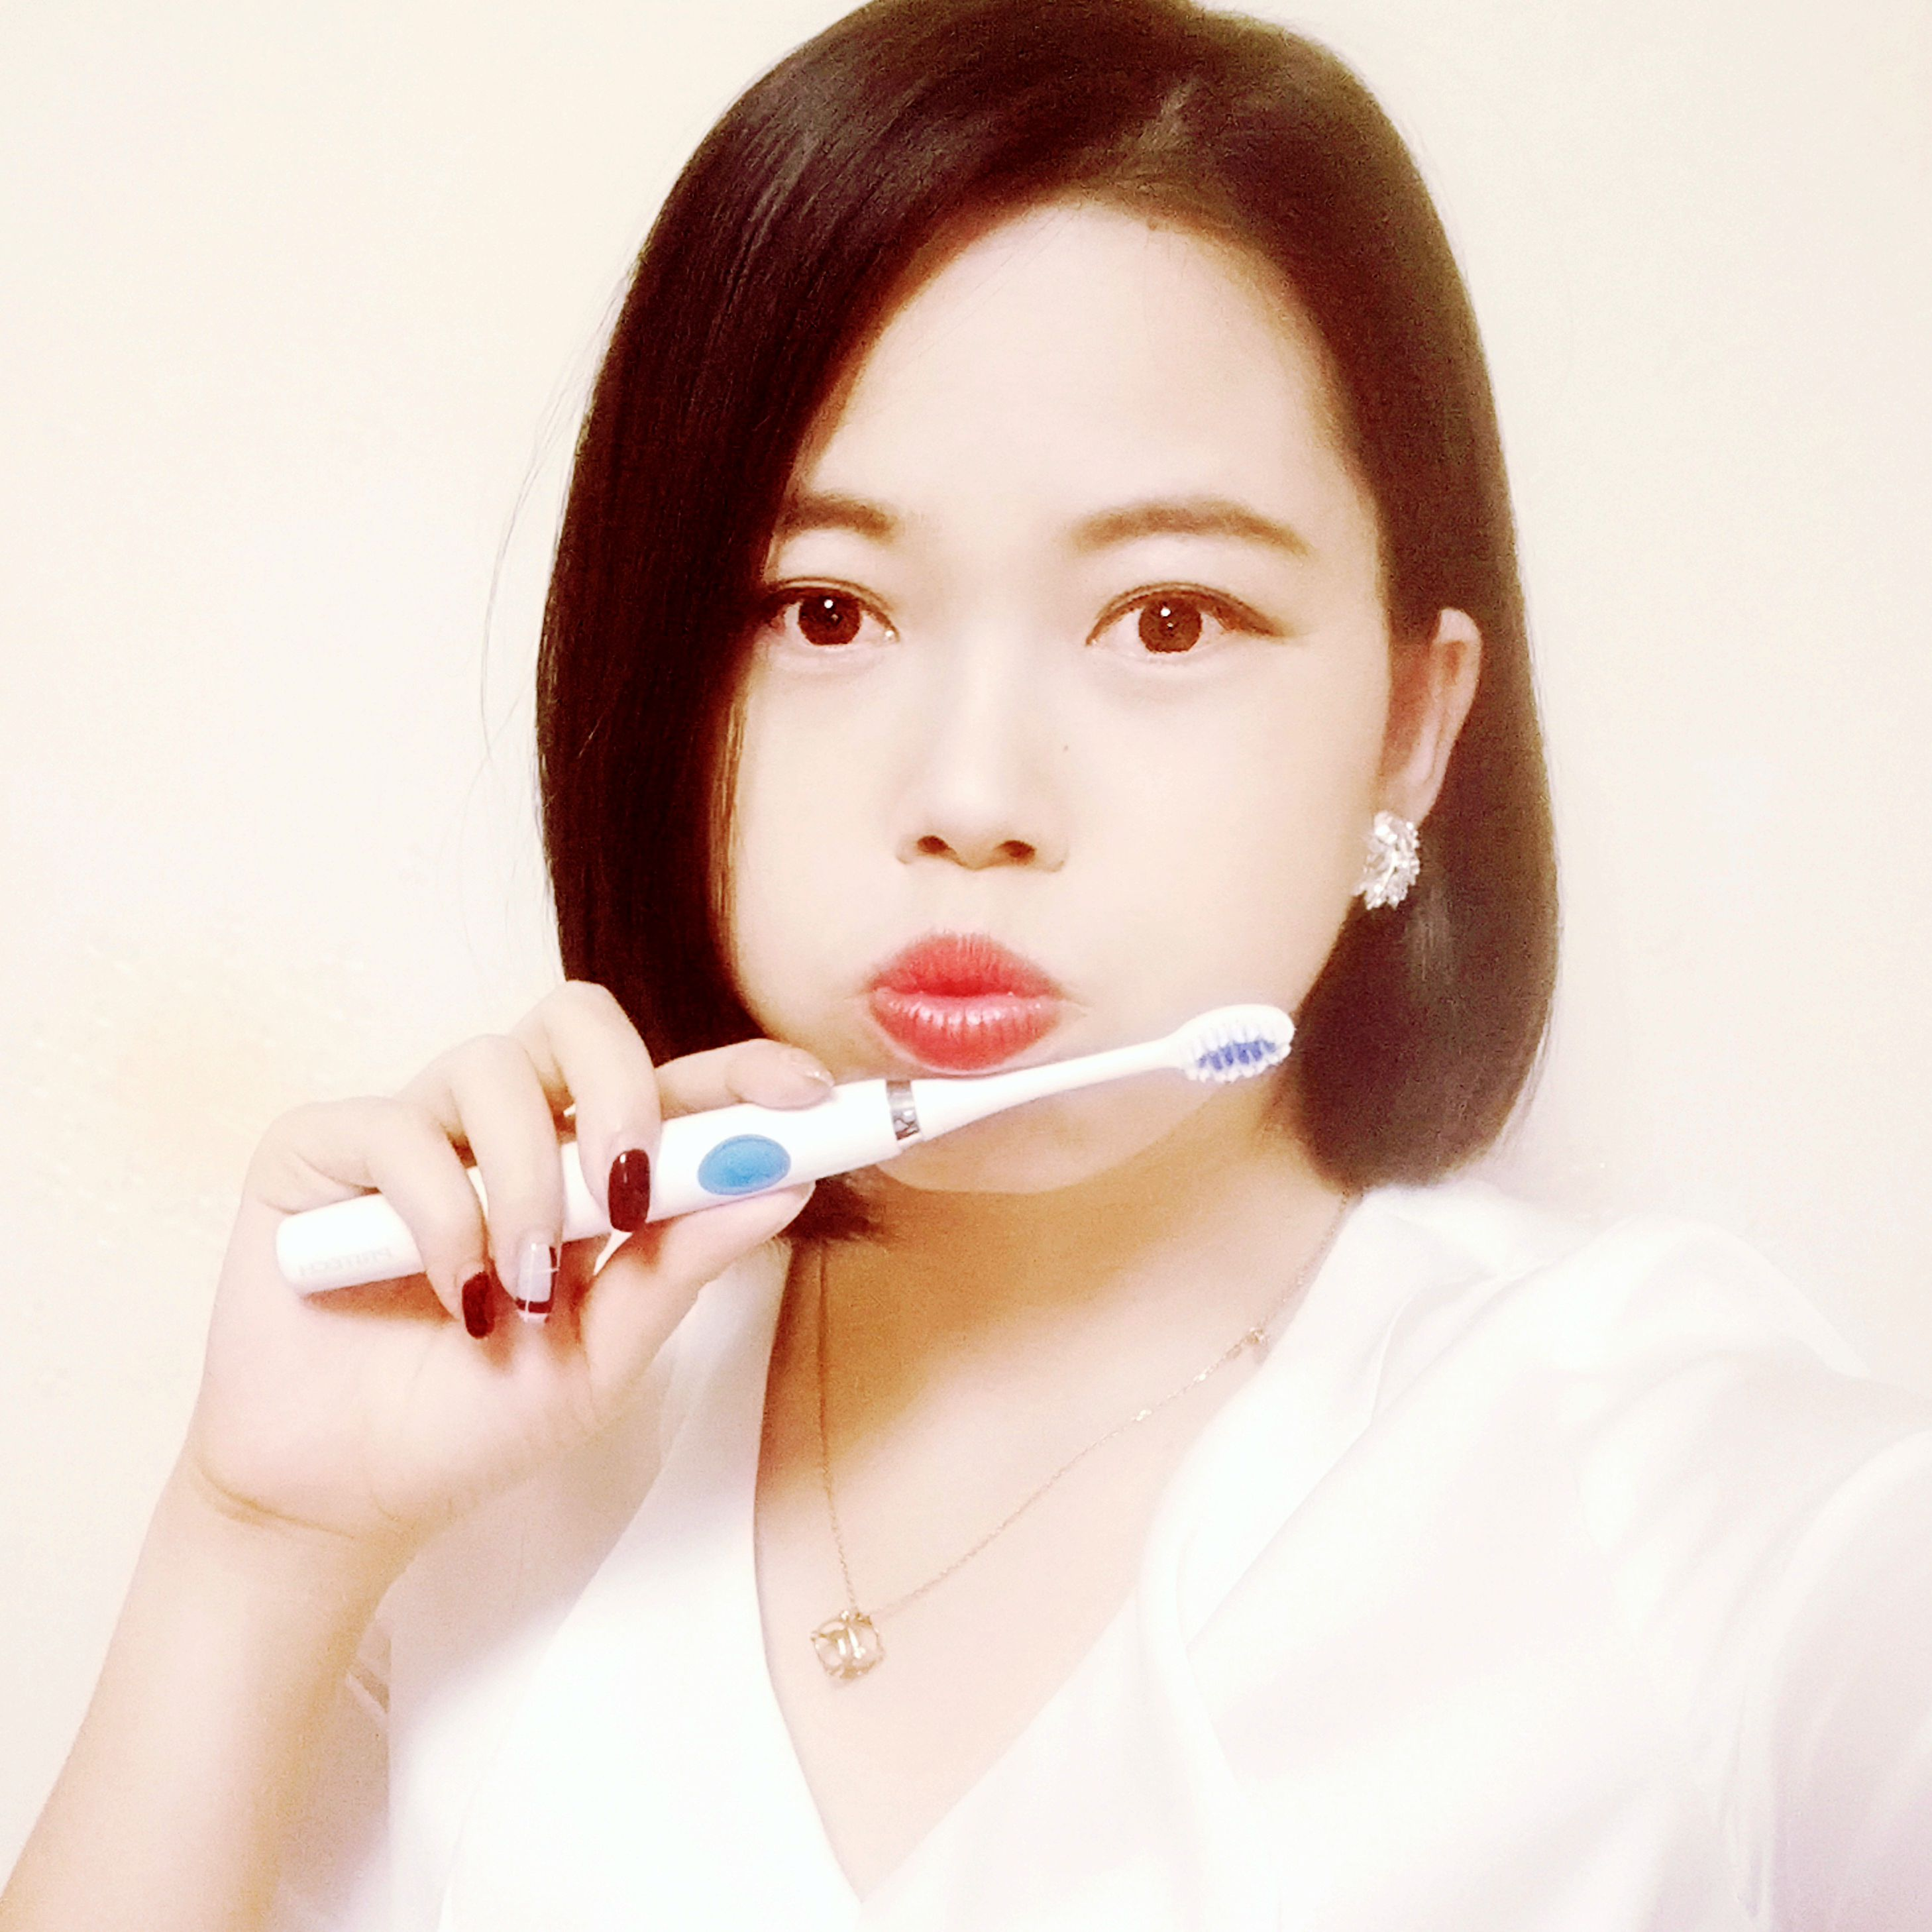 Pritech匹奇电动牙刷声波震动防水电动牙刷杜邦刷毛可换刷头